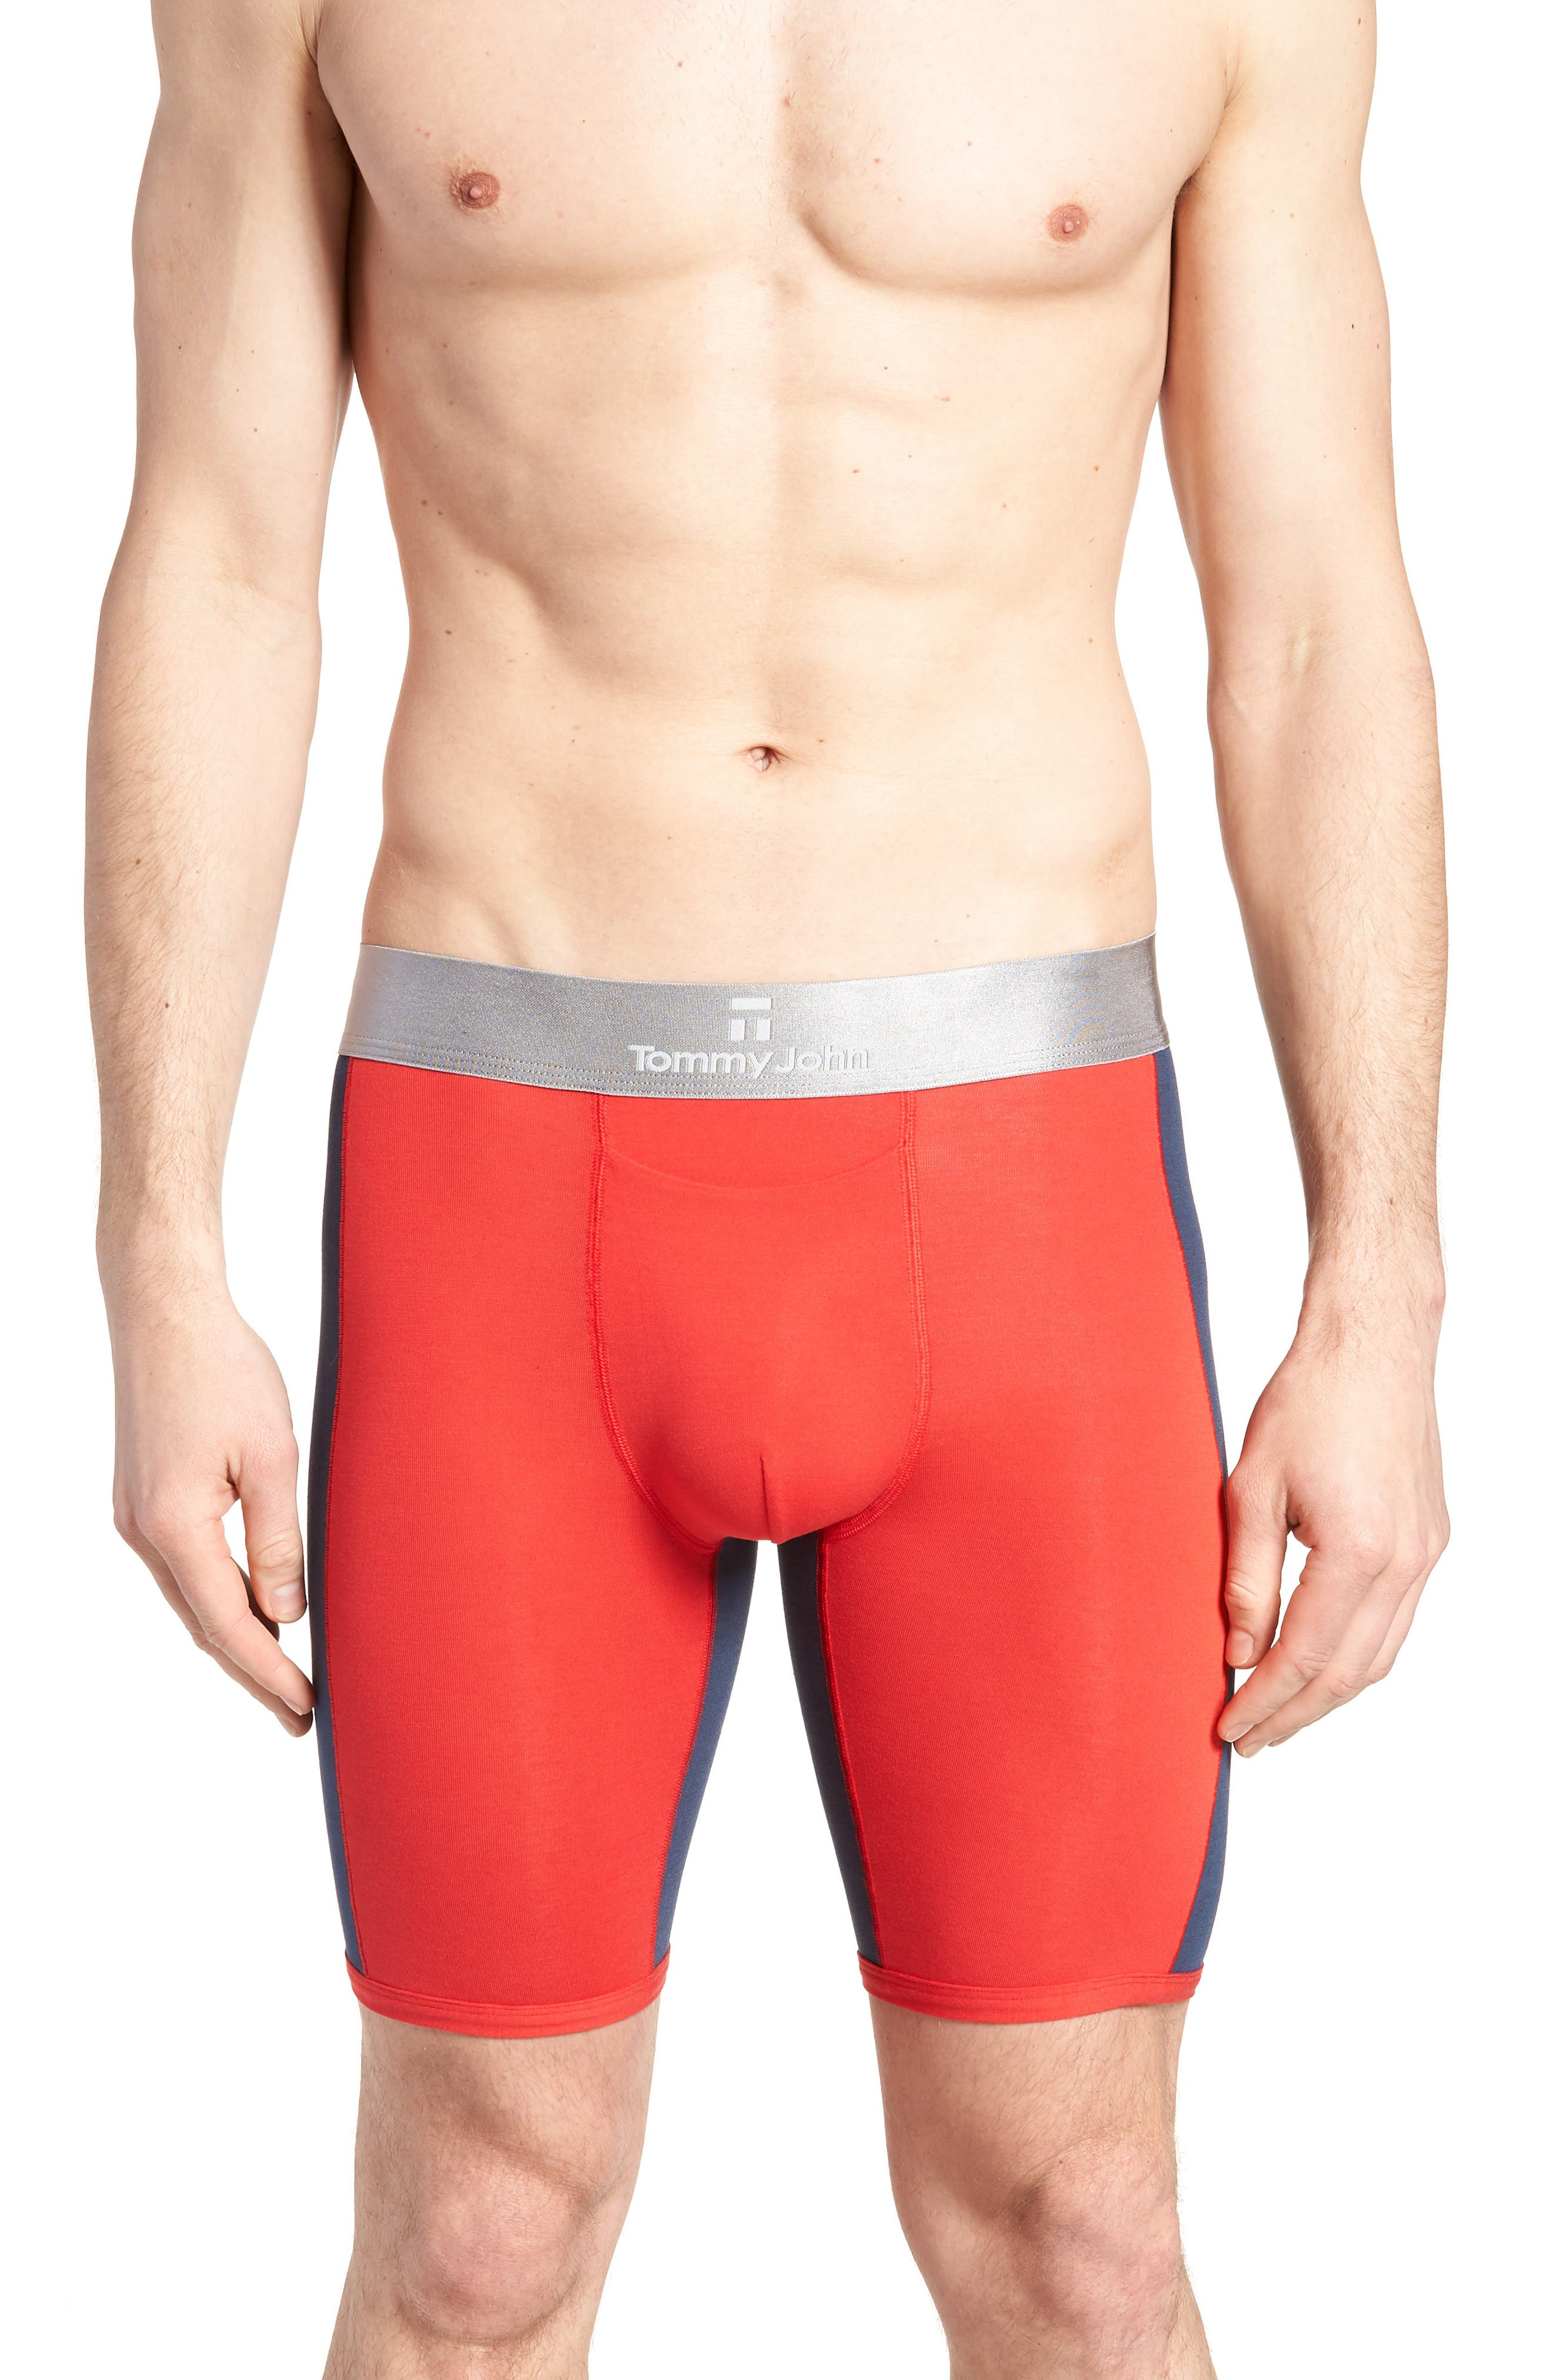 Second Skin Boxer Briefs,                             Main thumbnail 1, color,                             True Red/ Dress Blue